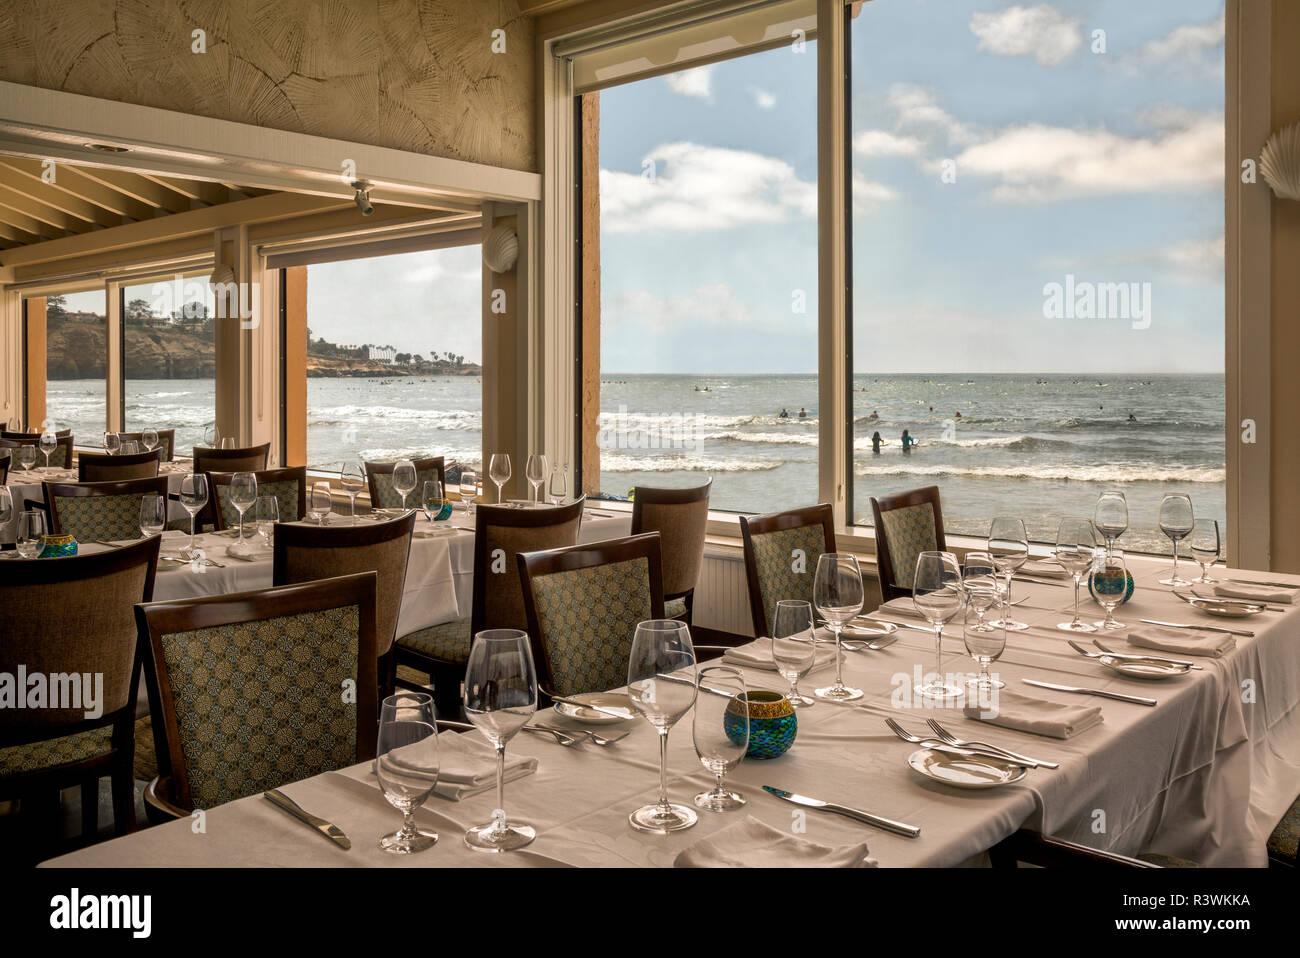 Usa California La Jolla The Marine Room Restaurant At La